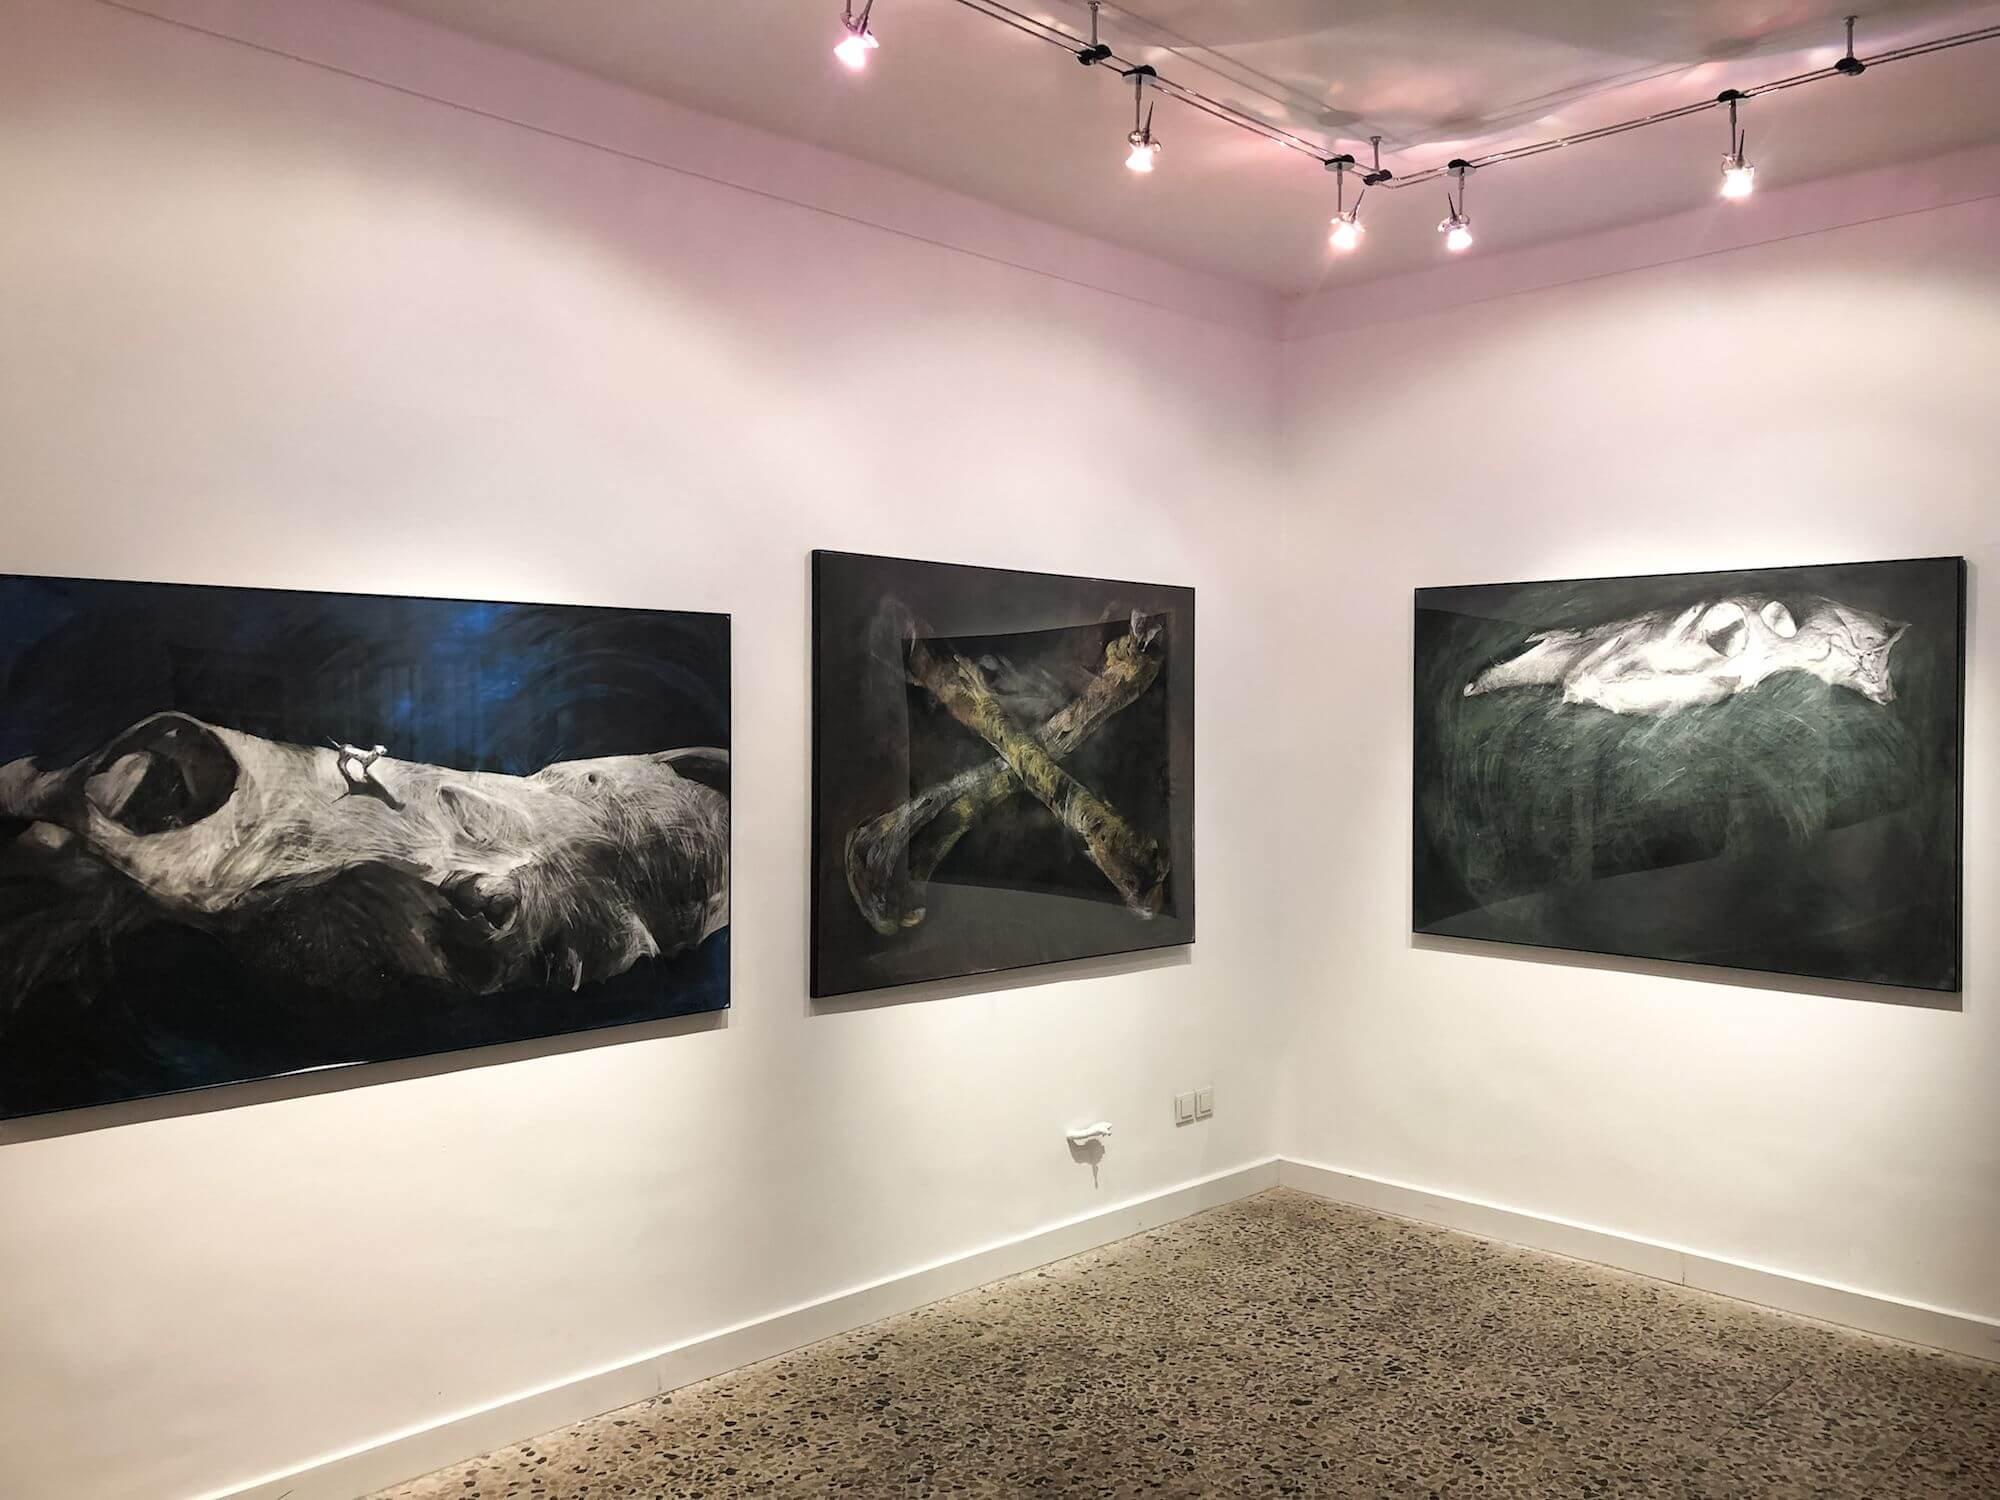 Teheran Homa Art Gallery compressor 3 giorni a Teheran